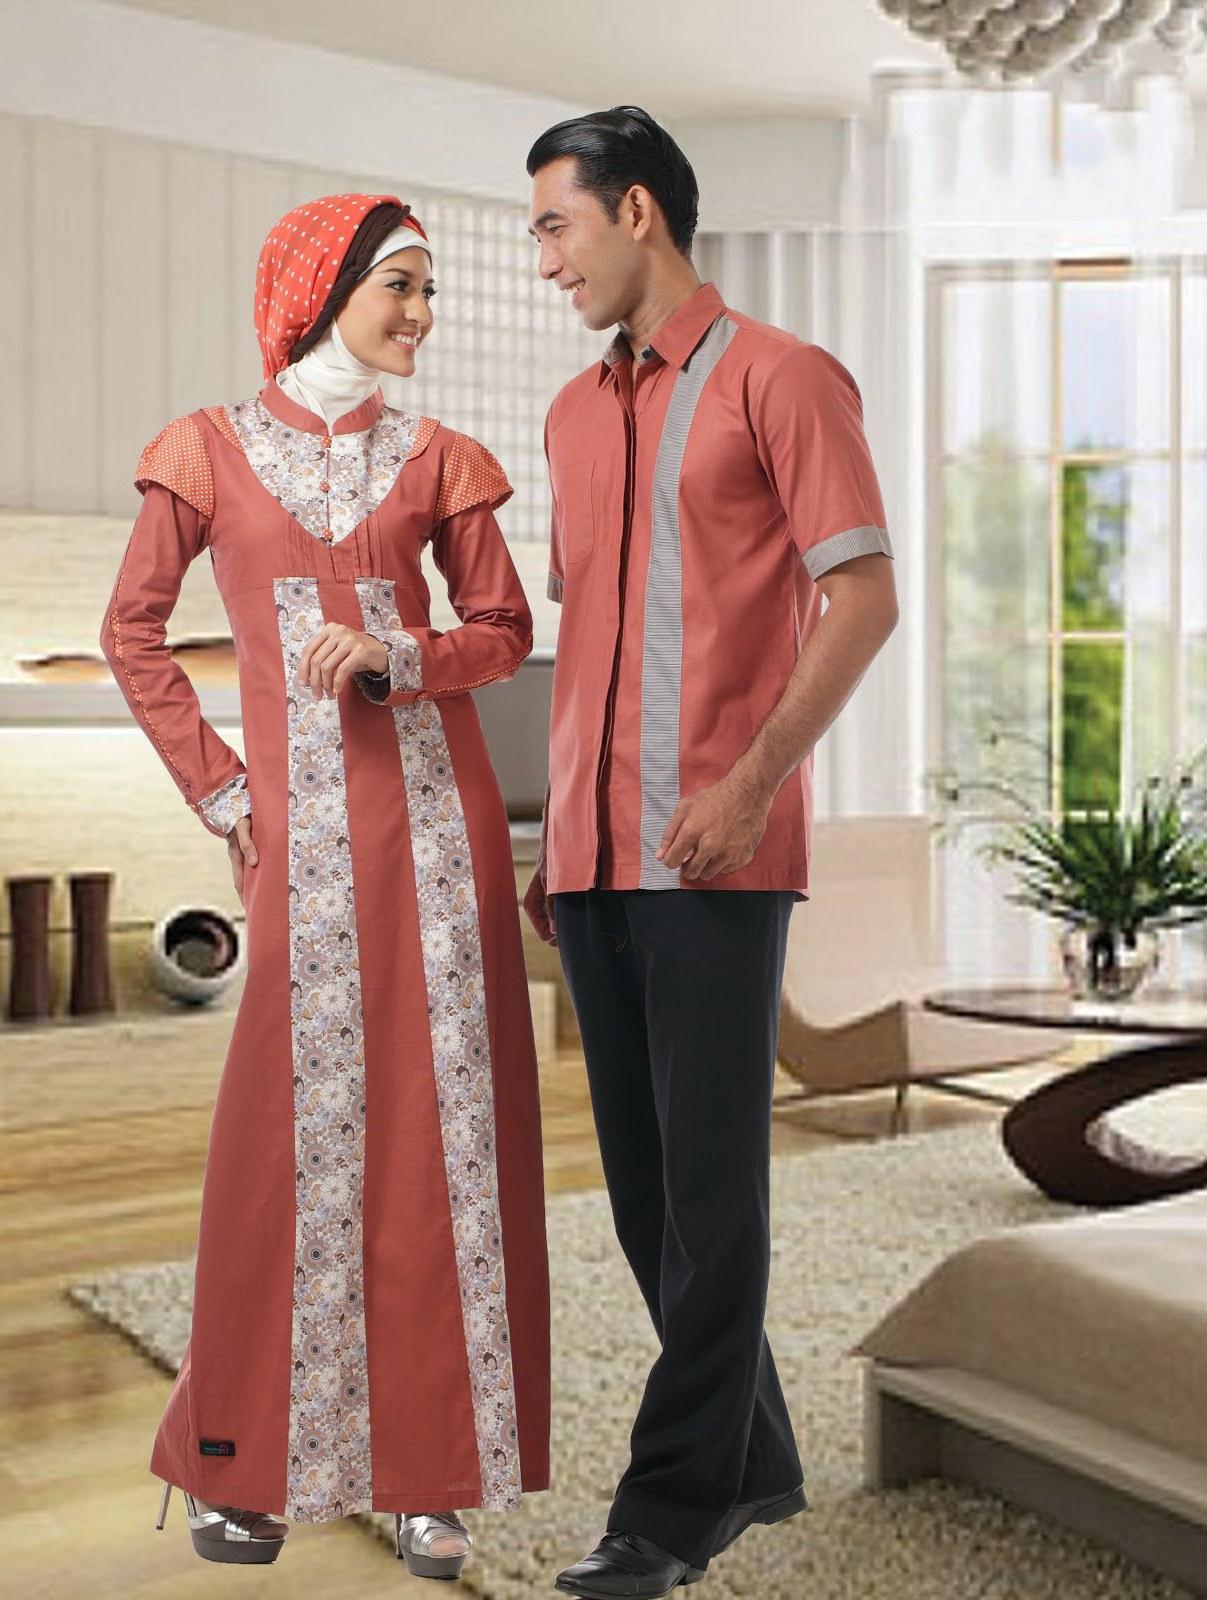 Inspirasi Baju Lebaran Sarimbit Bqdd Trend Model Baju Batik Lebaran Terbaru 2013